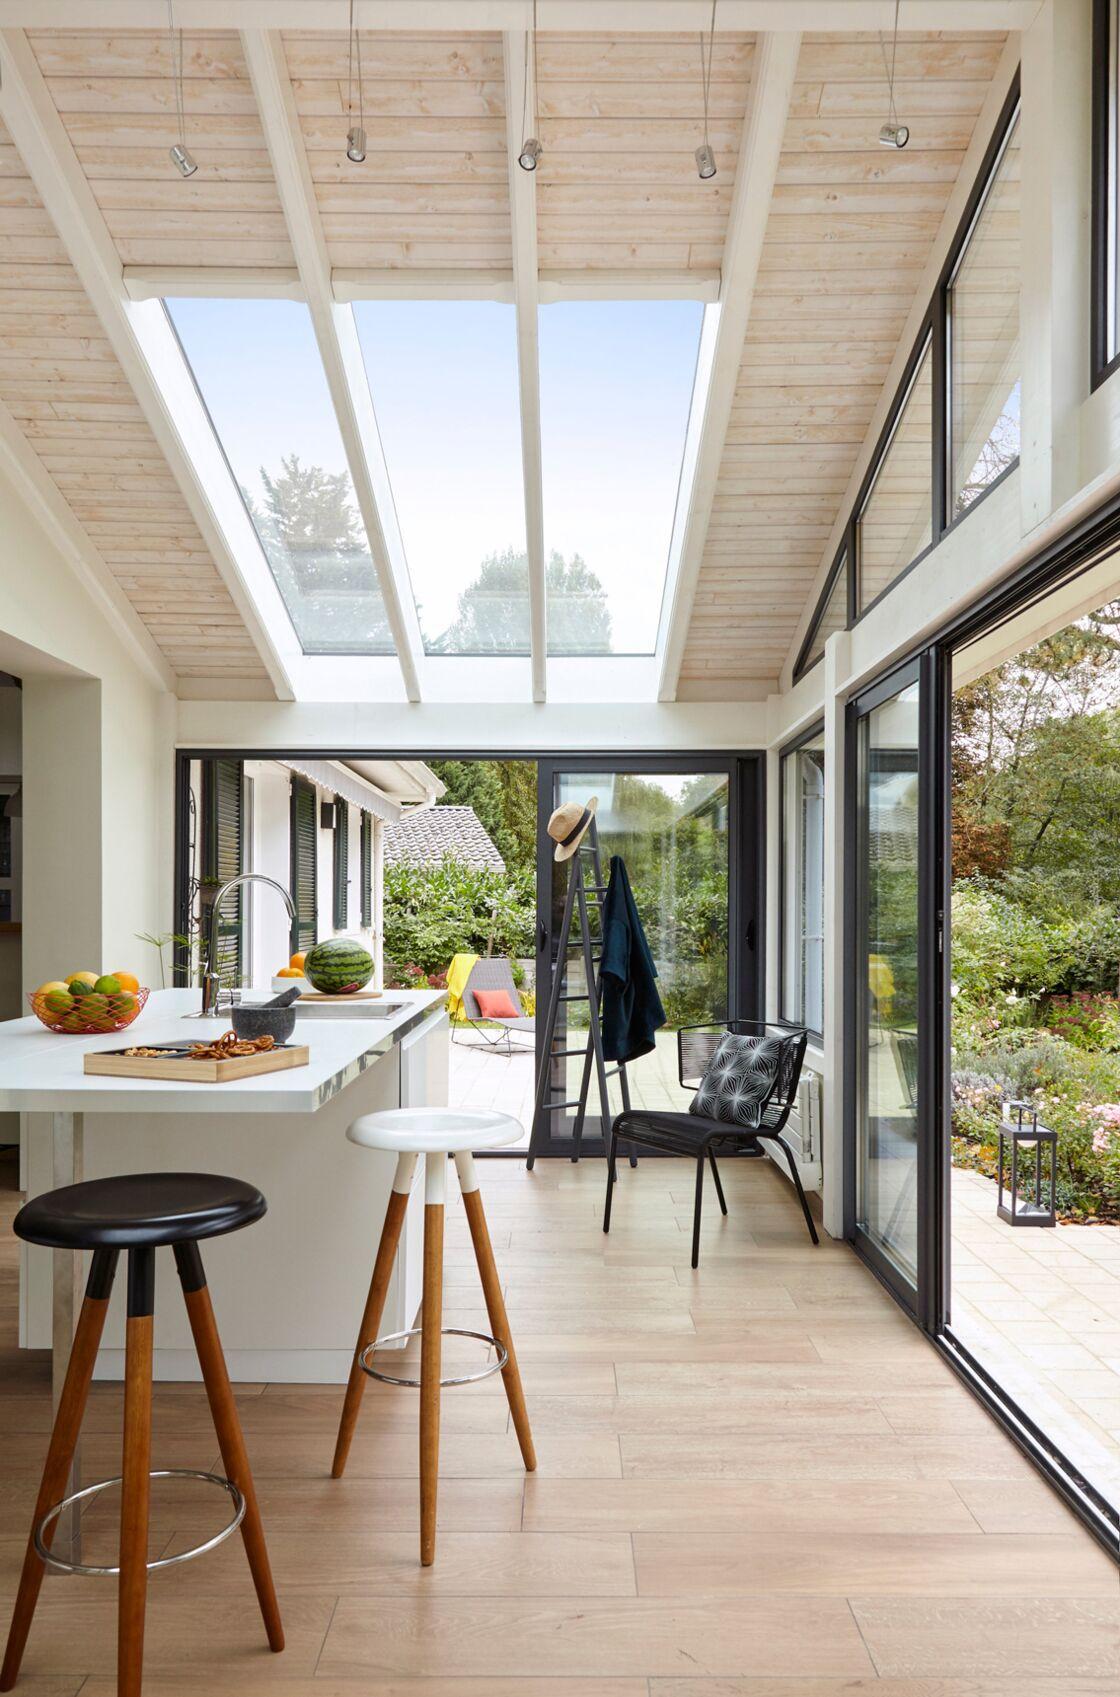 5 id es pour une v randa lumineuse femme actuelle le mag. Black Bedroom Furniture Sets. Home Design Ideas